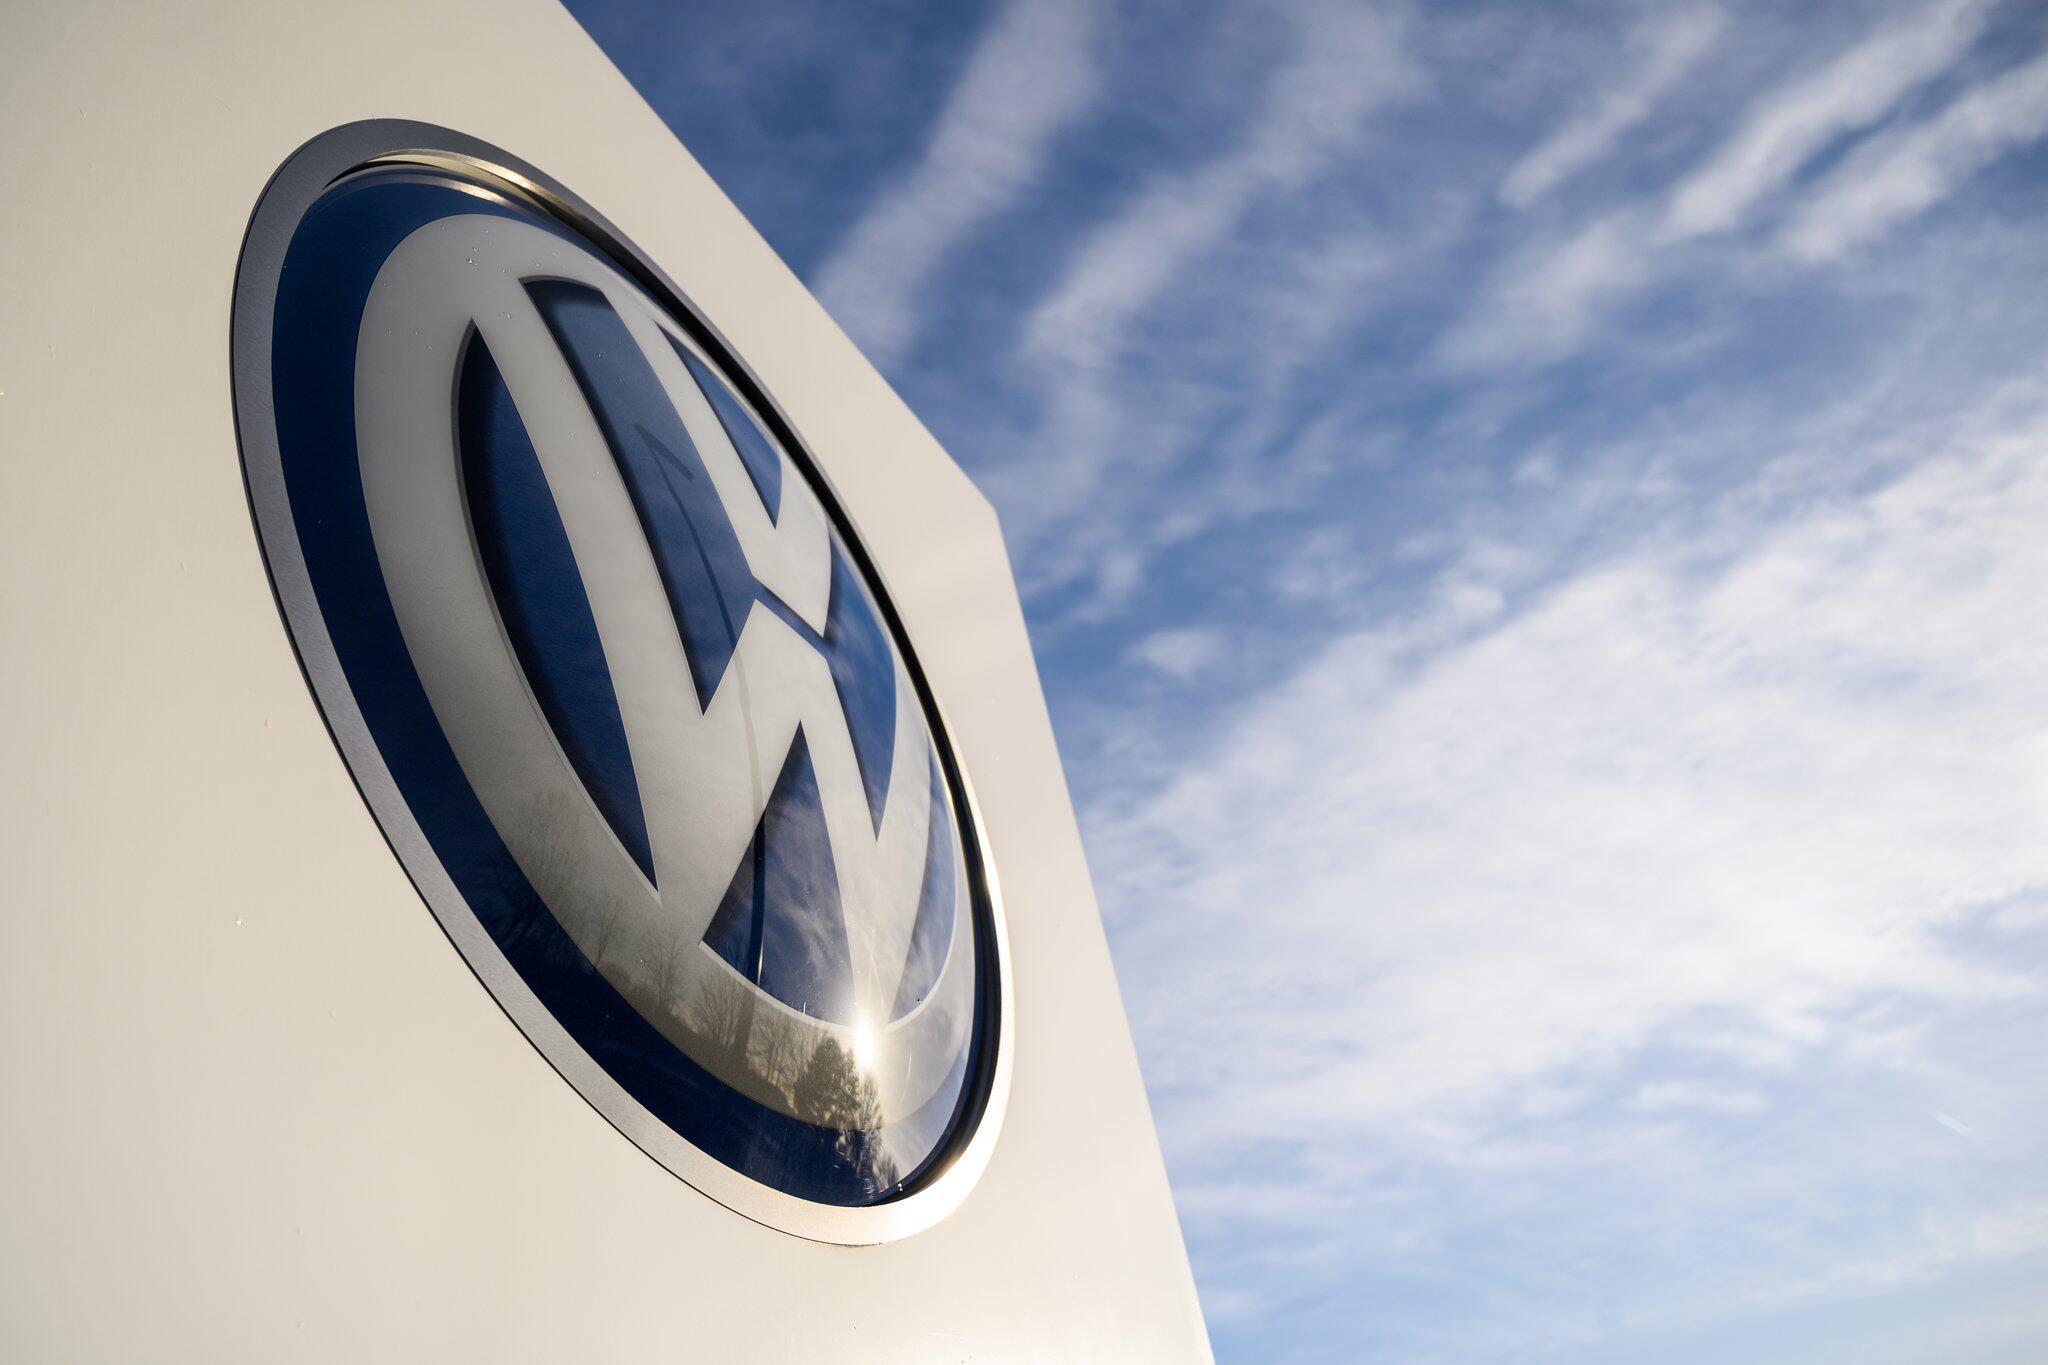 Bild zu VW strebt Traton-Börsengang vor Sommerpause 2019 an